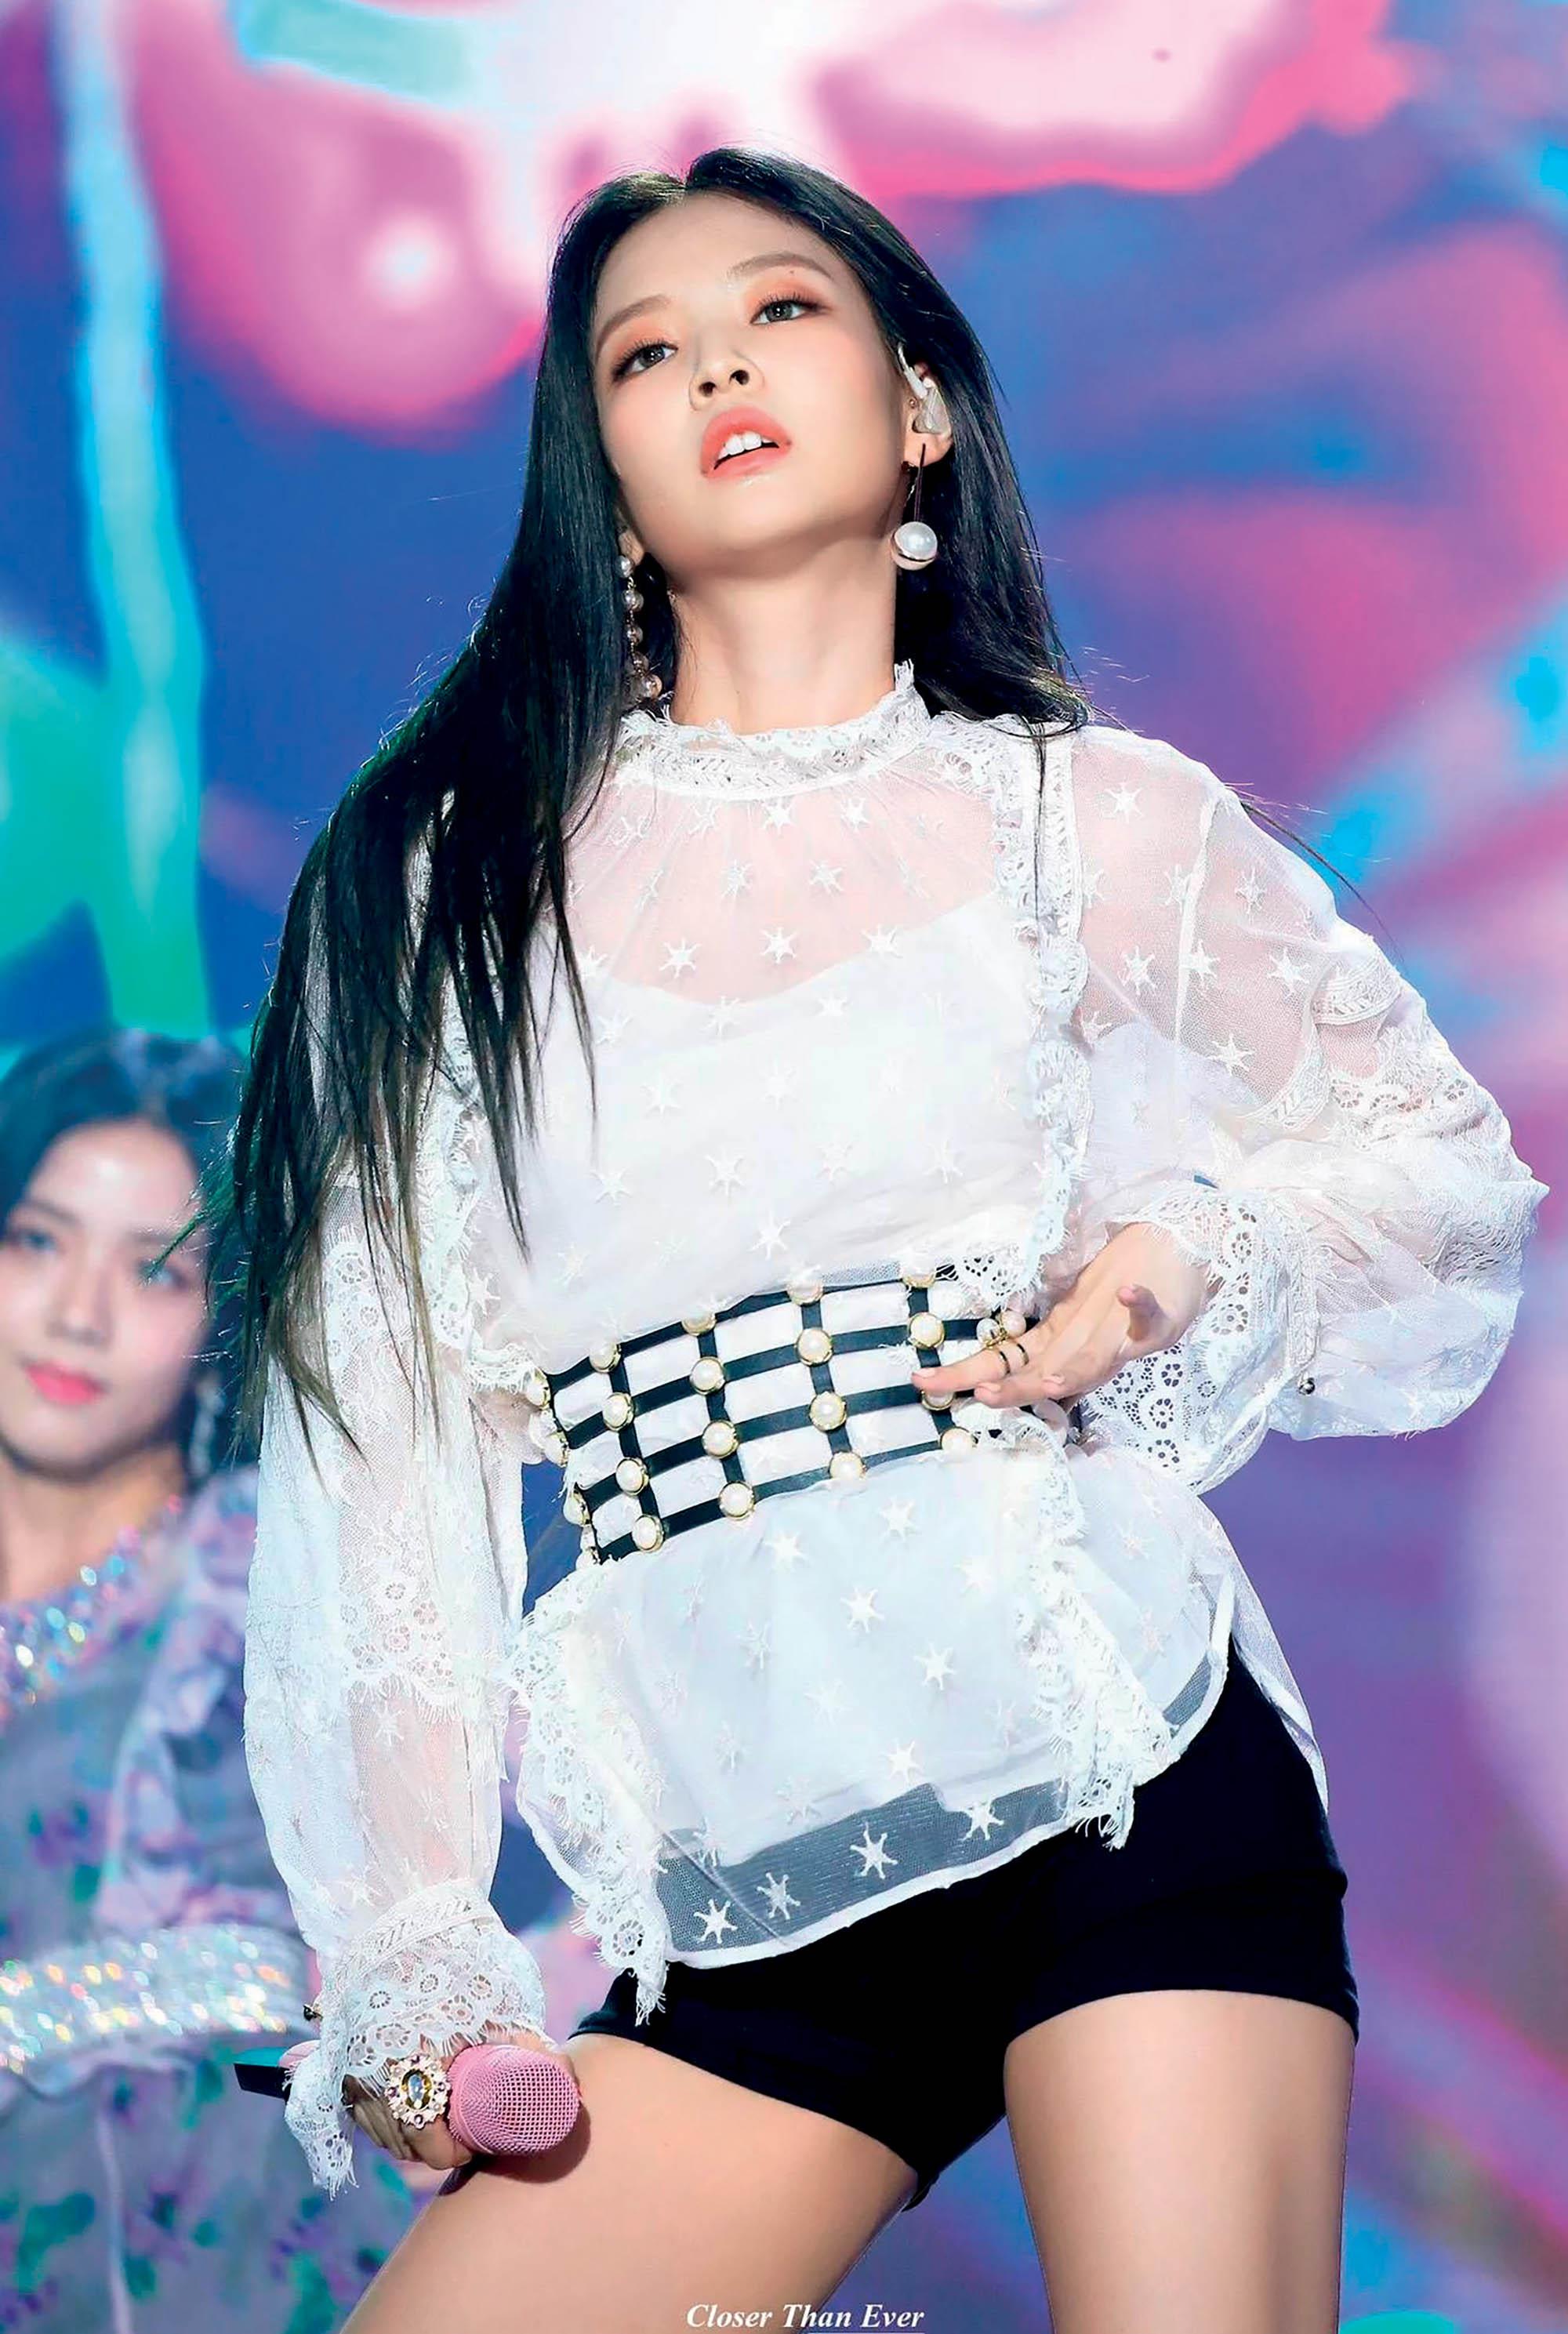 Jennie Kim BlackPink nữ ca sĩ trẻ